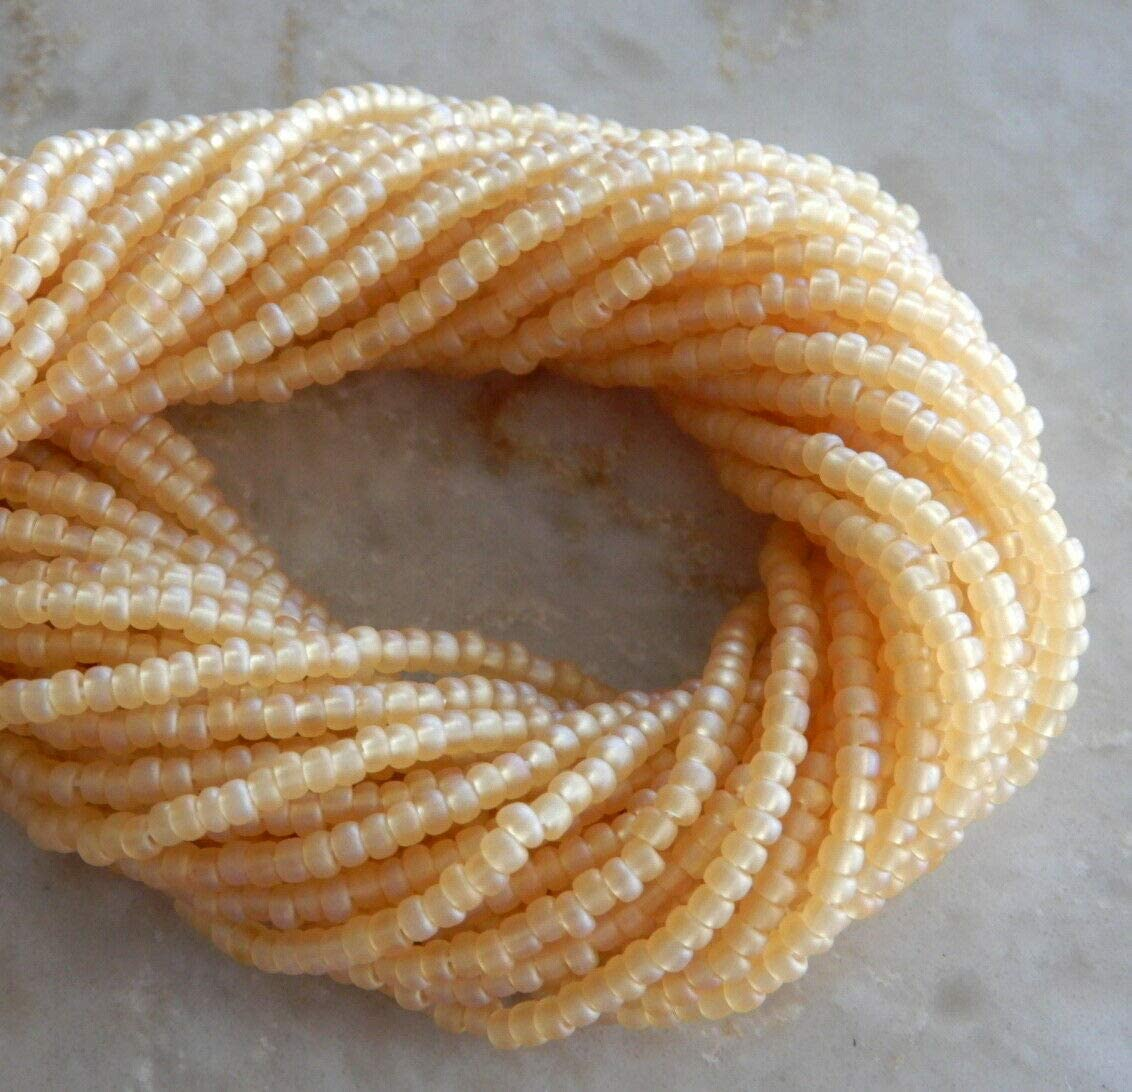 Beads - Jewelry Making - Beading - DIY Crafting 4000 Light Topaz AB Frost Glass 11/0 2.1mm Seed Bulk Hank Yellow